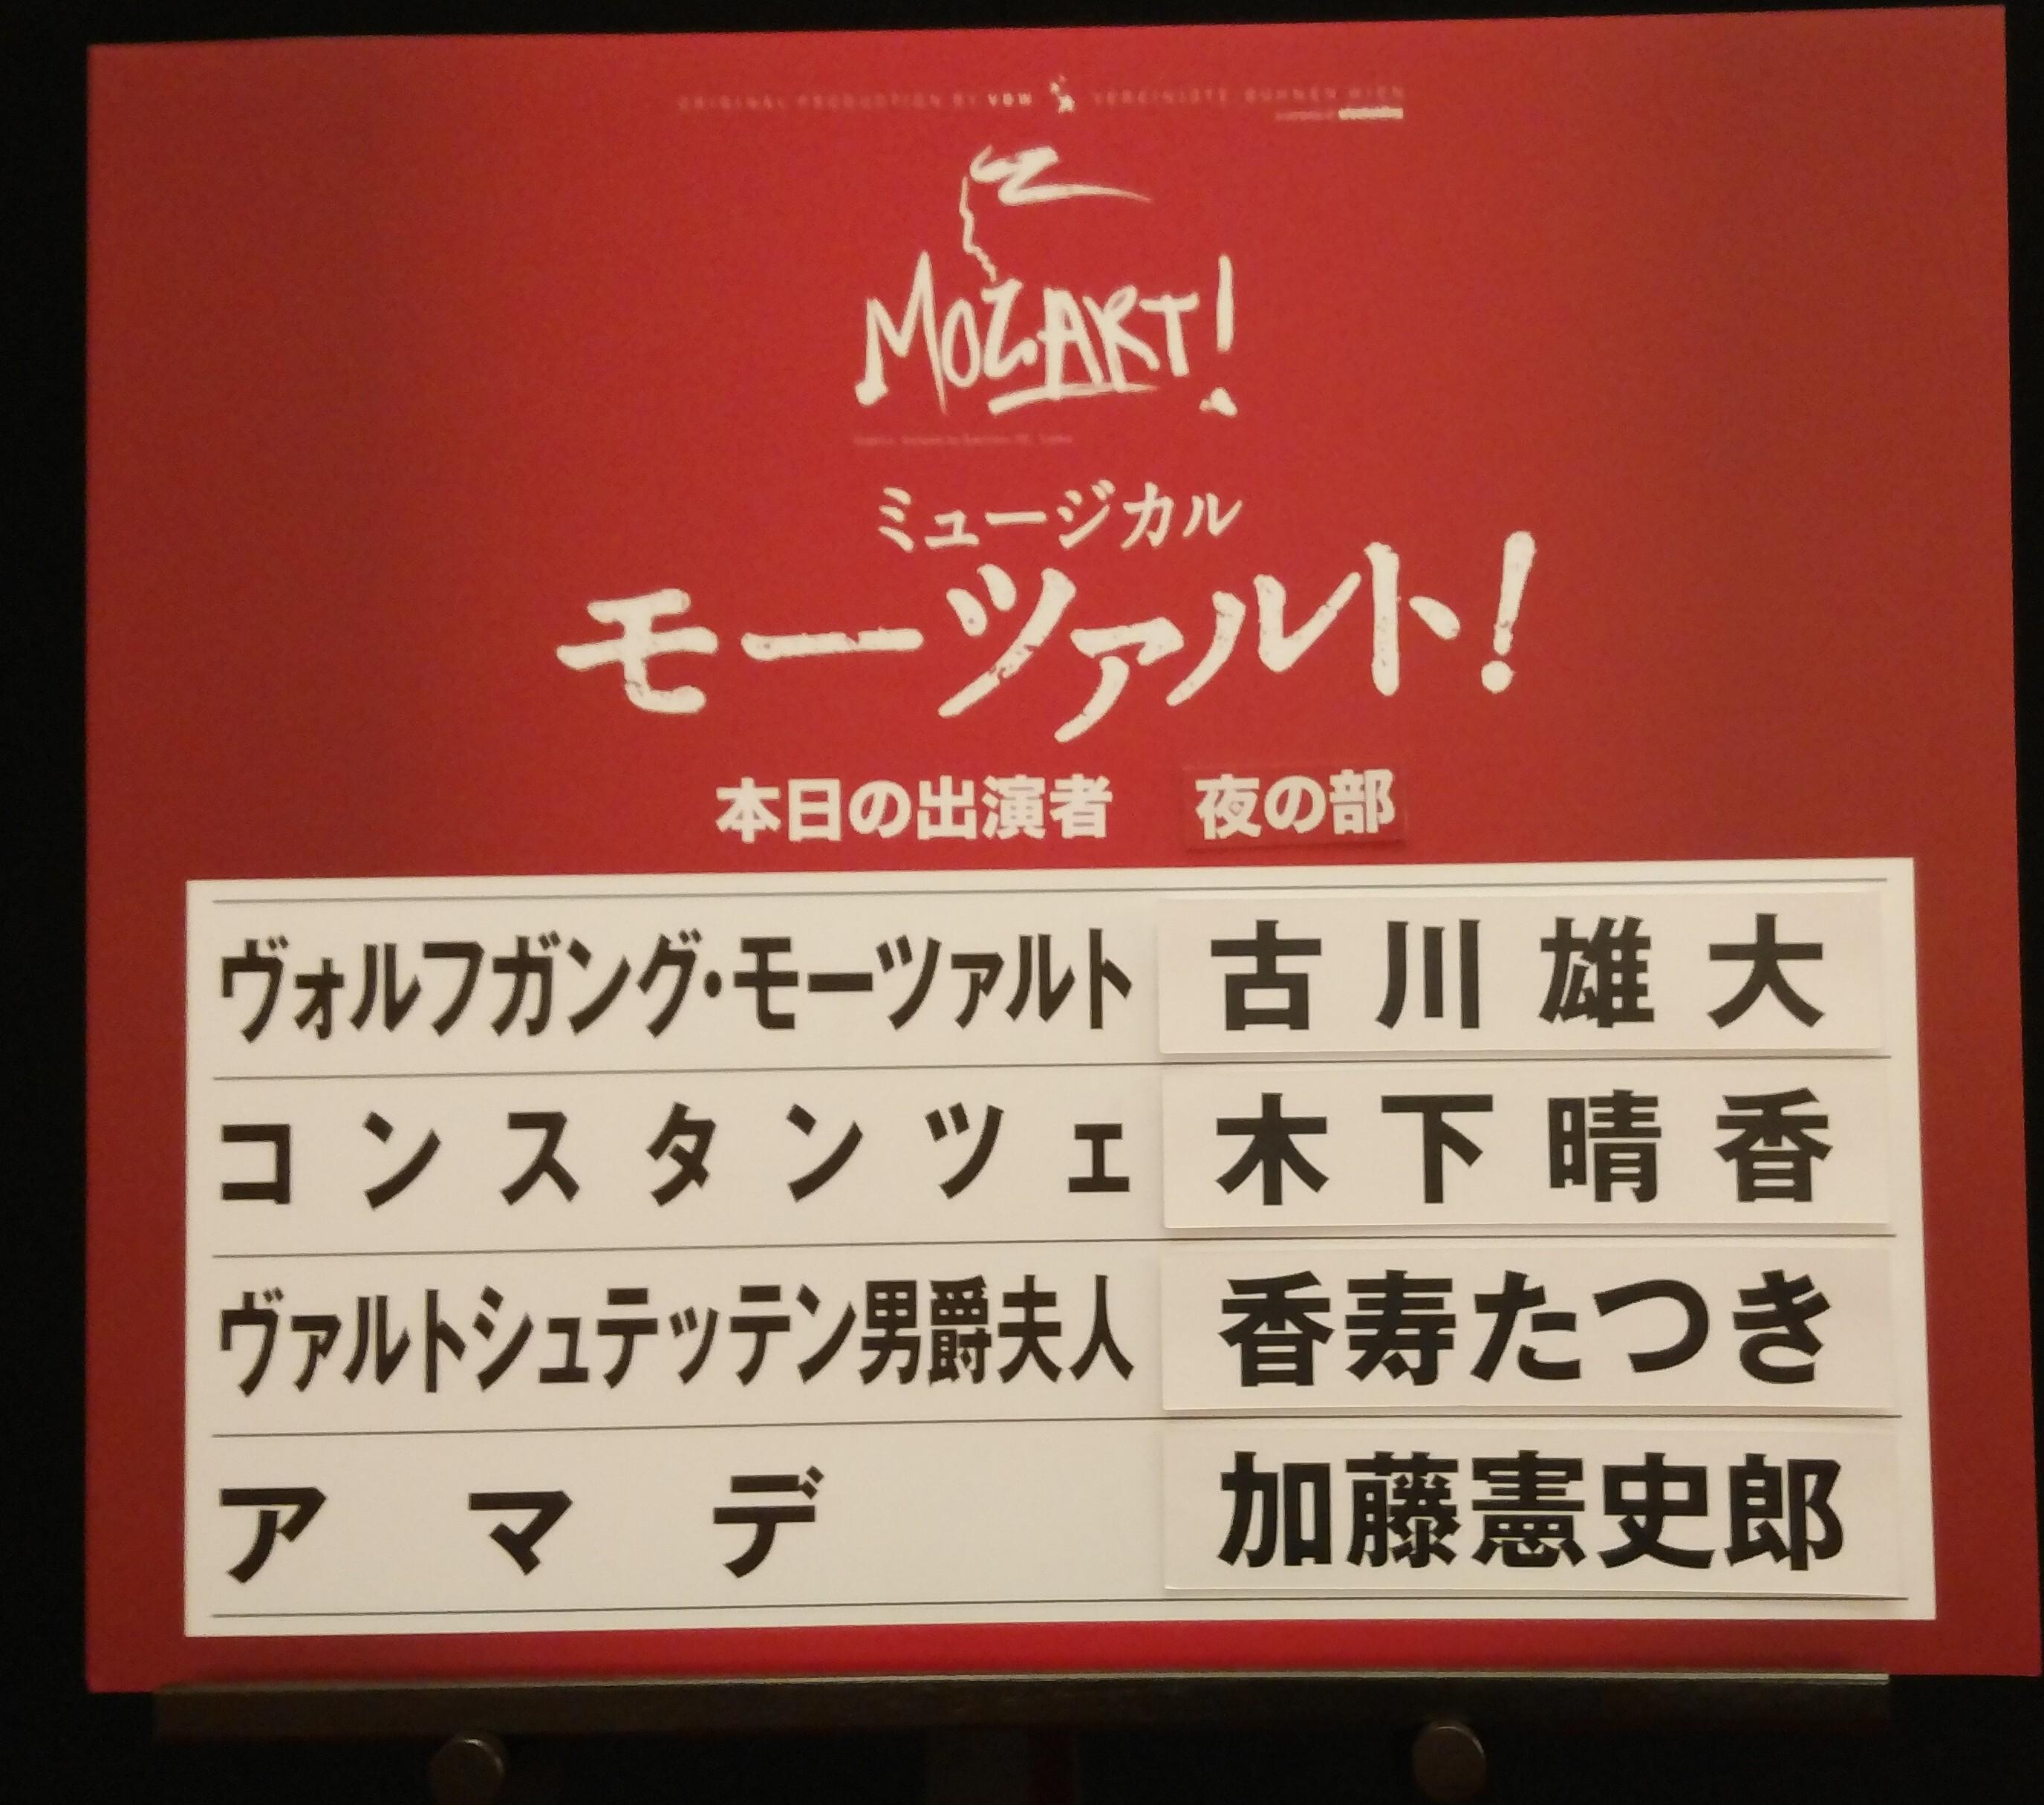 8/18「MOZART!」前楽